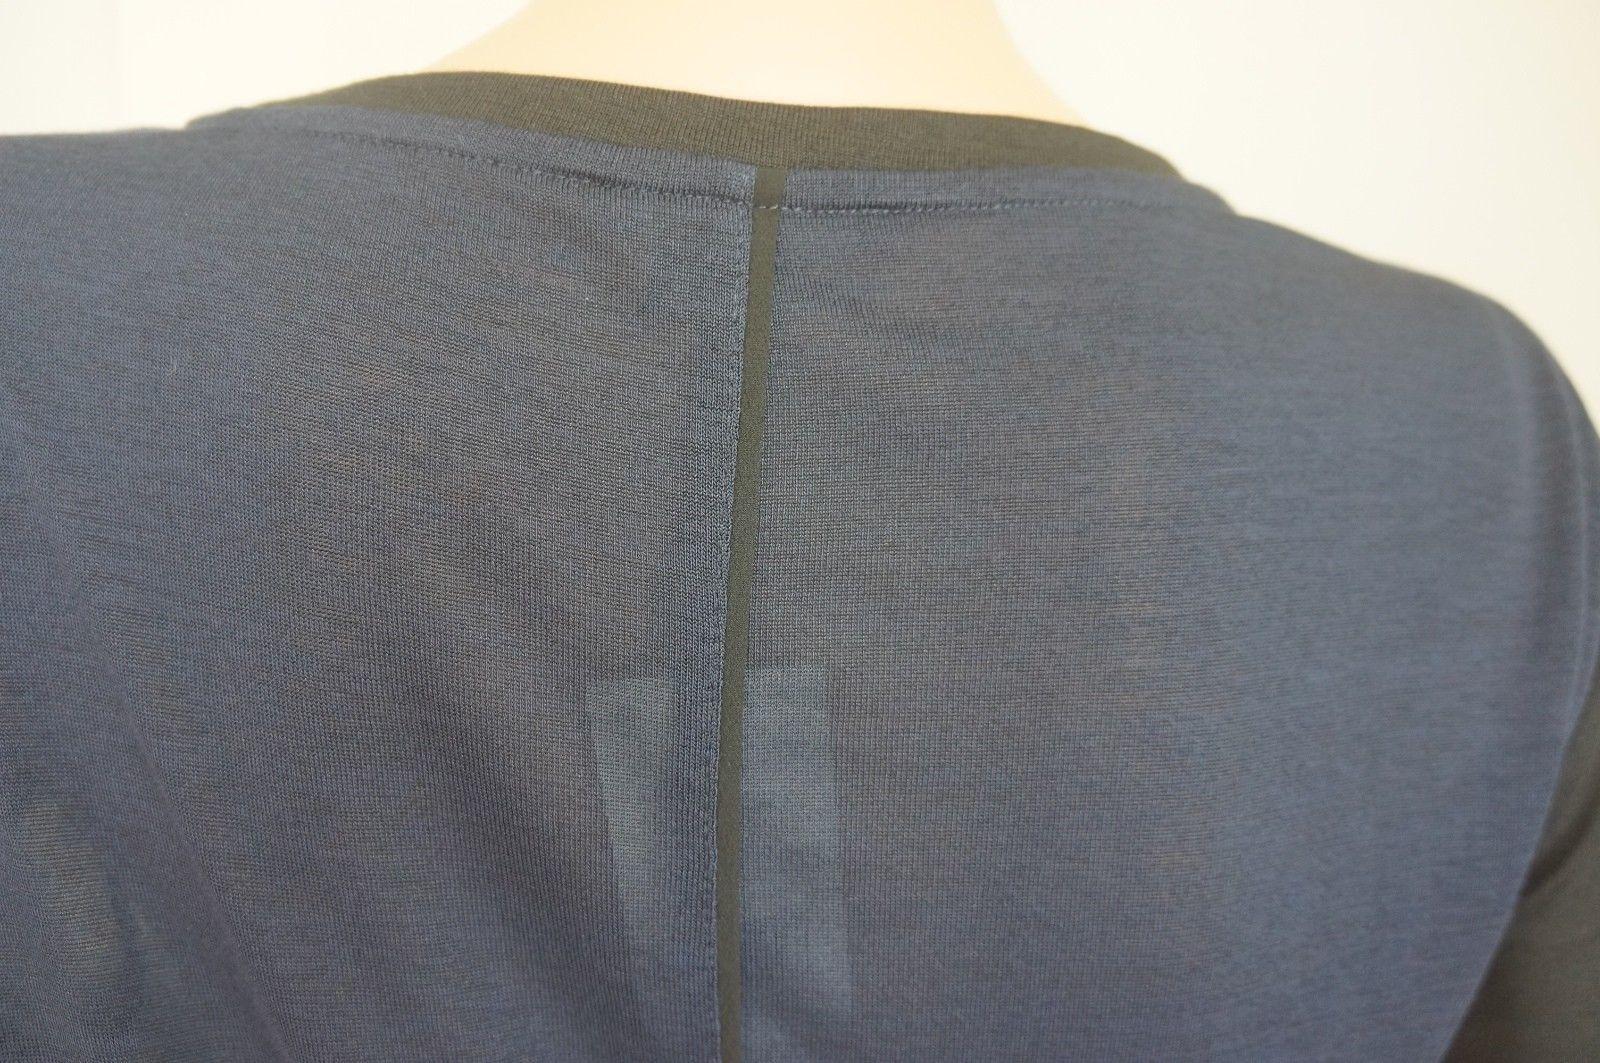 $135+NEW Vince Black/Dark Blue Top T-shirt Blouse Sz S